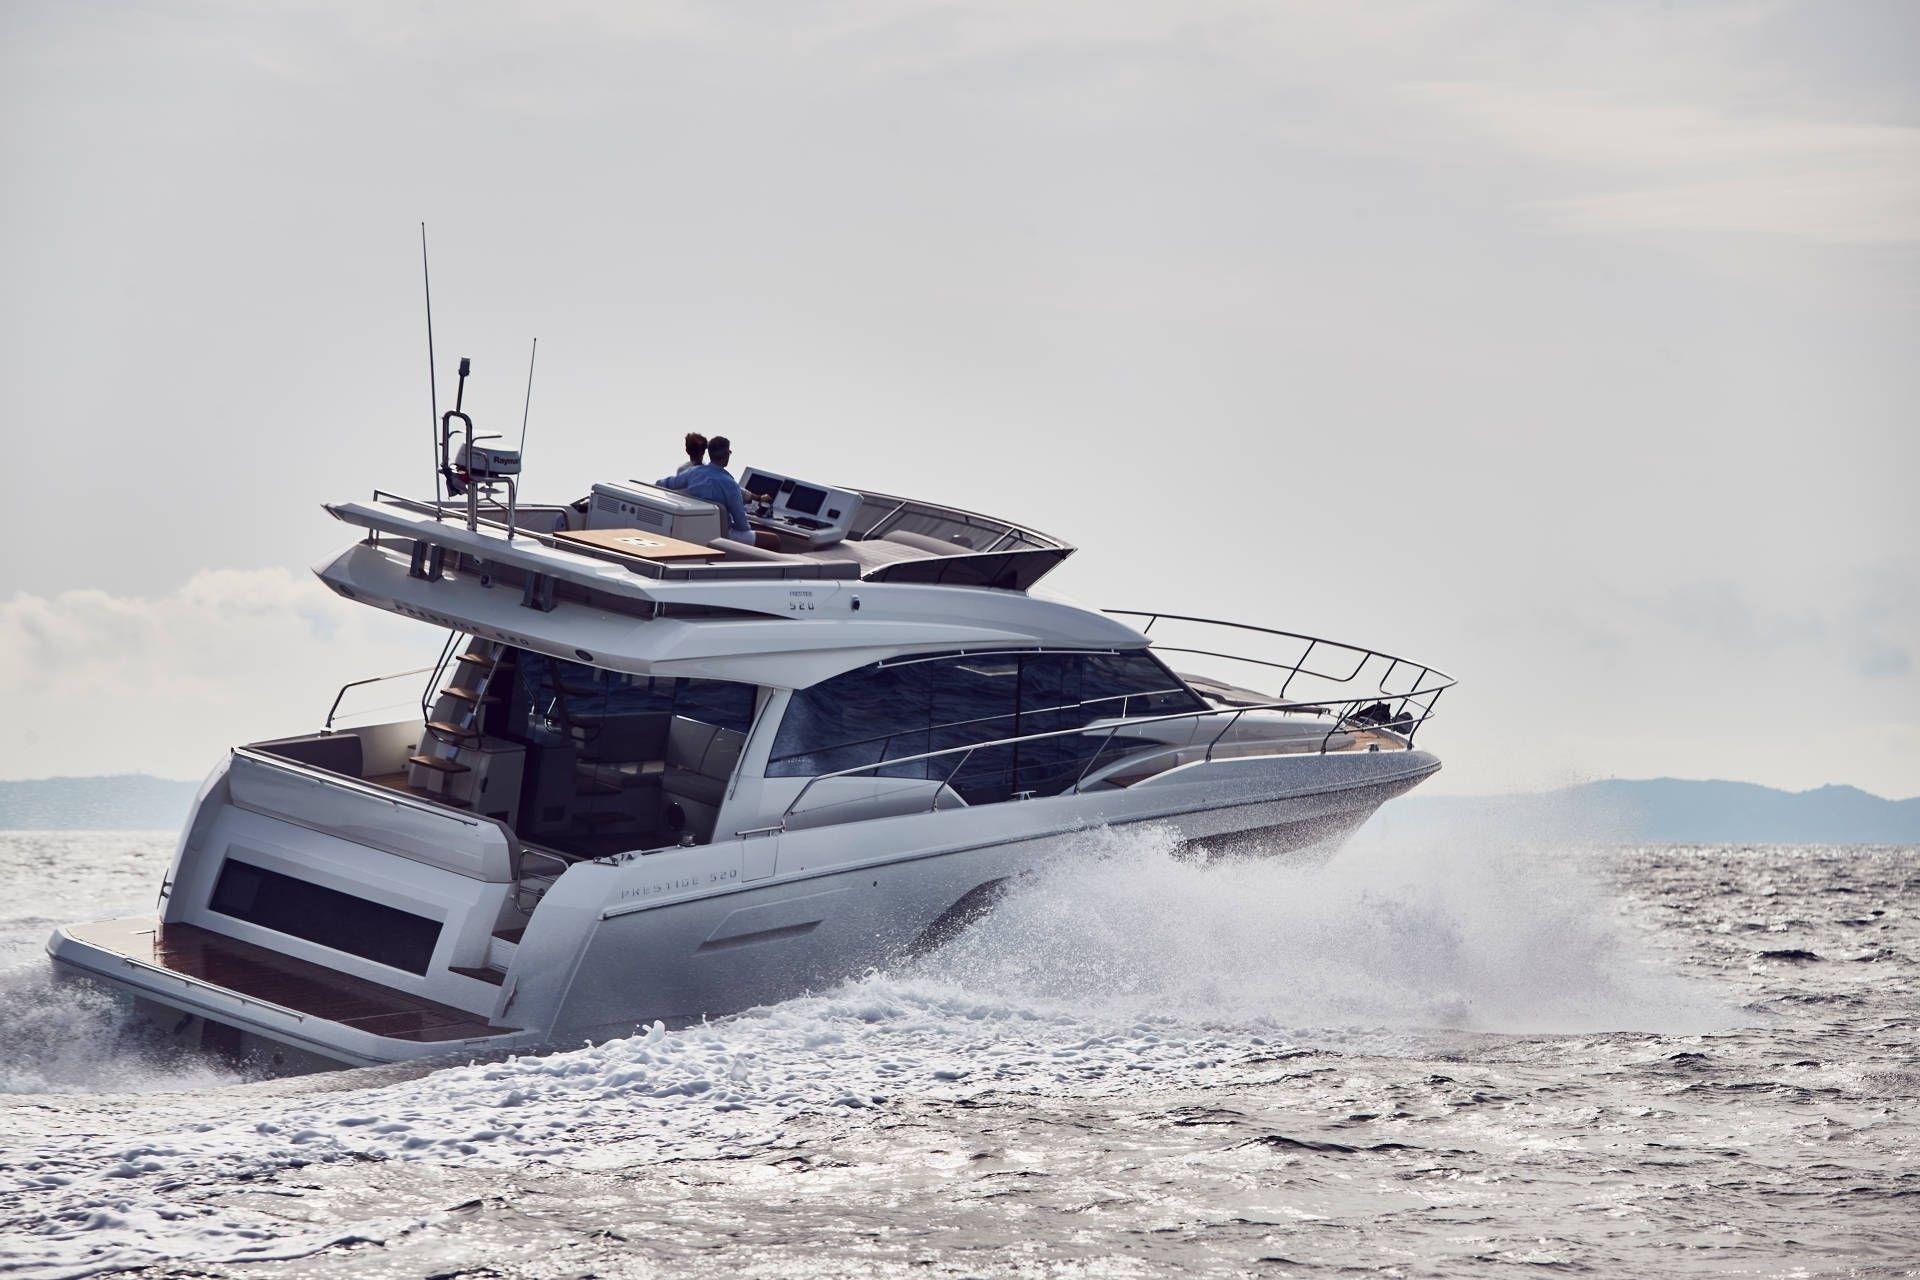 Prestige 520 - Day Charter - 2019 - Cannes - Saint Tropez - Monaco